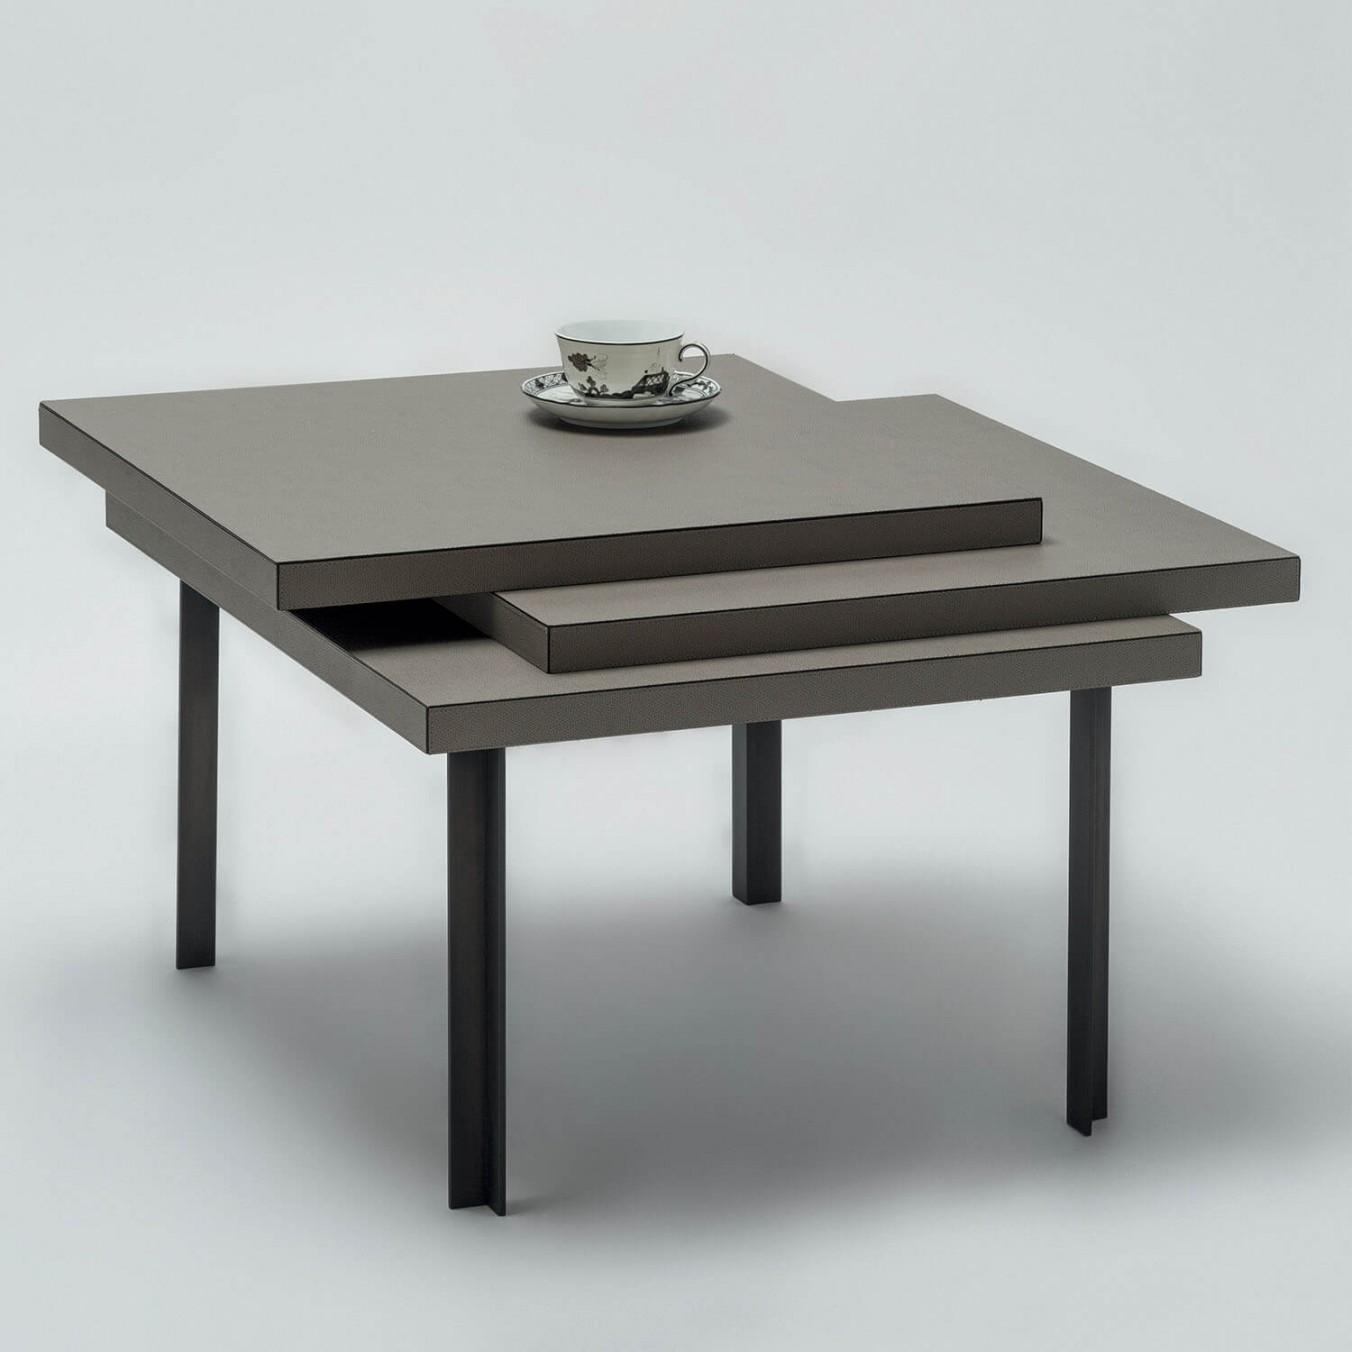 CASCADE SIDE TABLE 2